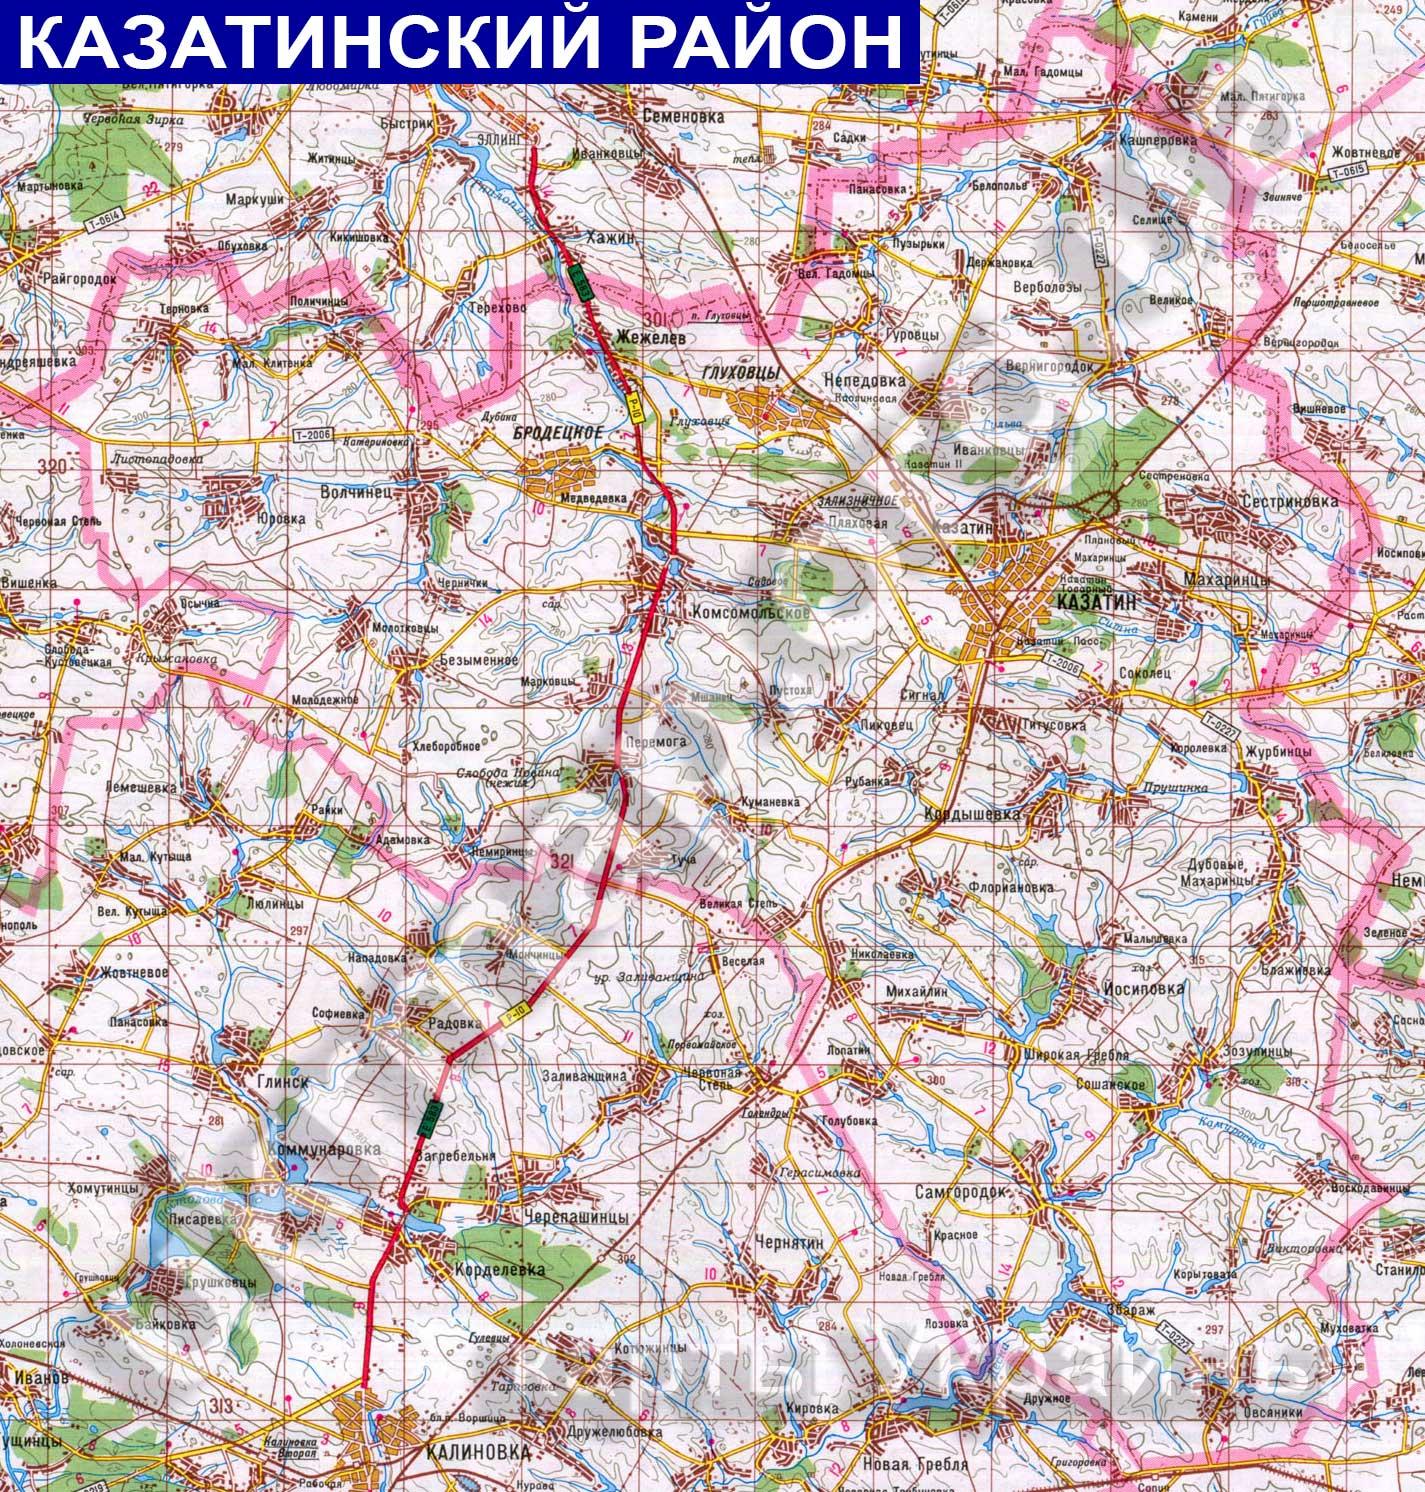 Подробная карта Казатинского района: http://ukrmap.org.ua/Pages/Rayony_oblastey_Ukraine/Kazatinskiy_rayon2.htm